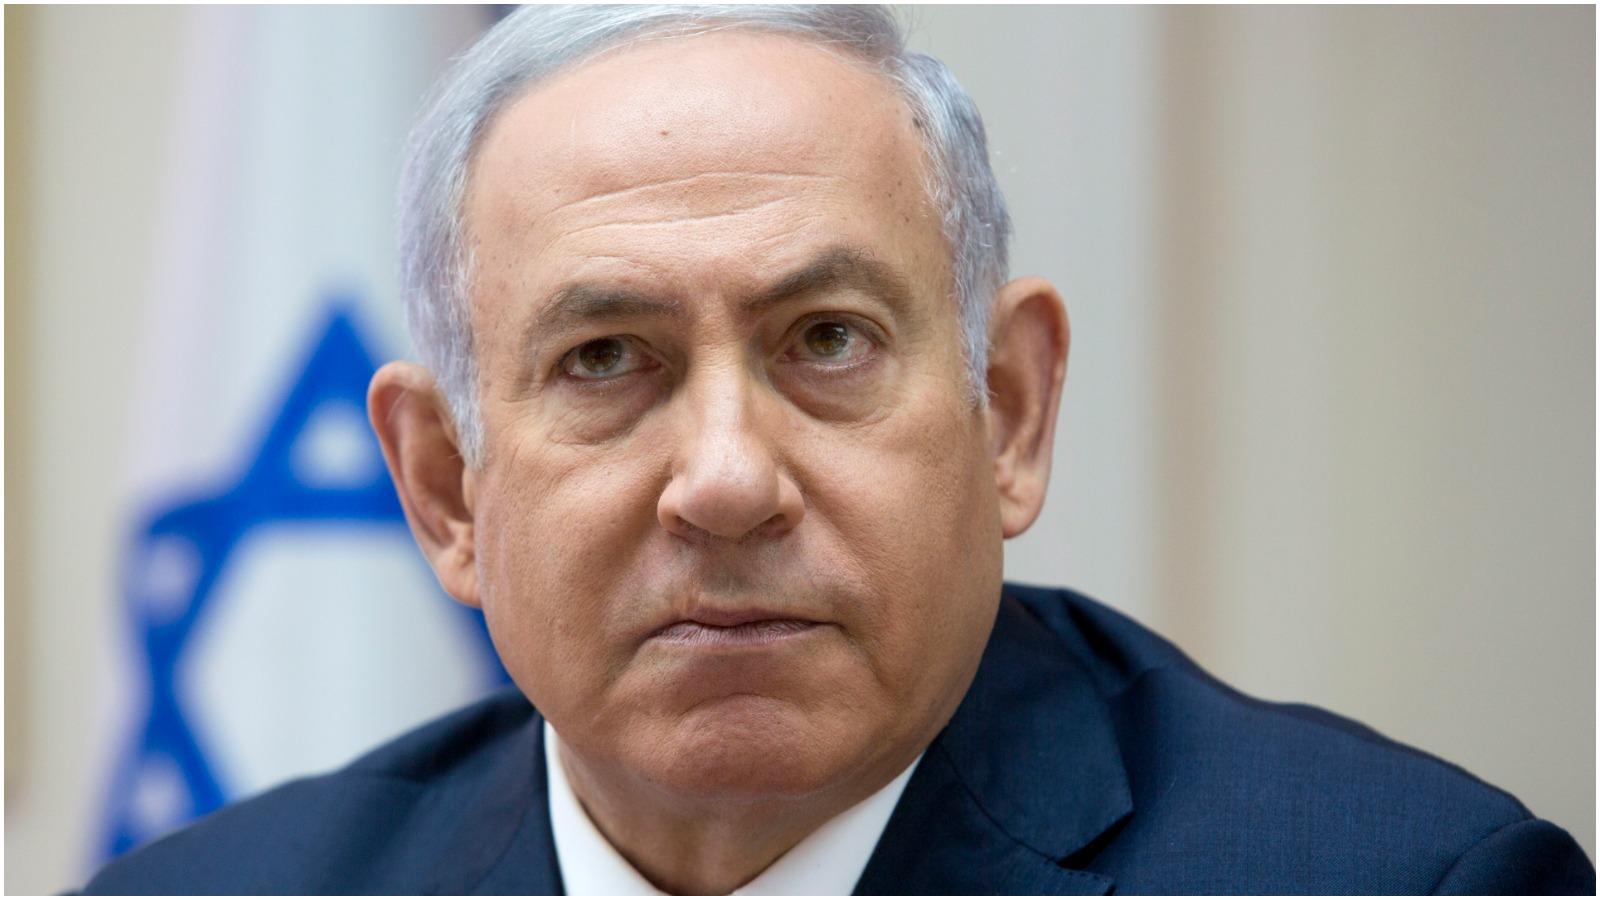 Hans Henrik Fafner i RÆSON35: Har Netanyahu tabt magten?